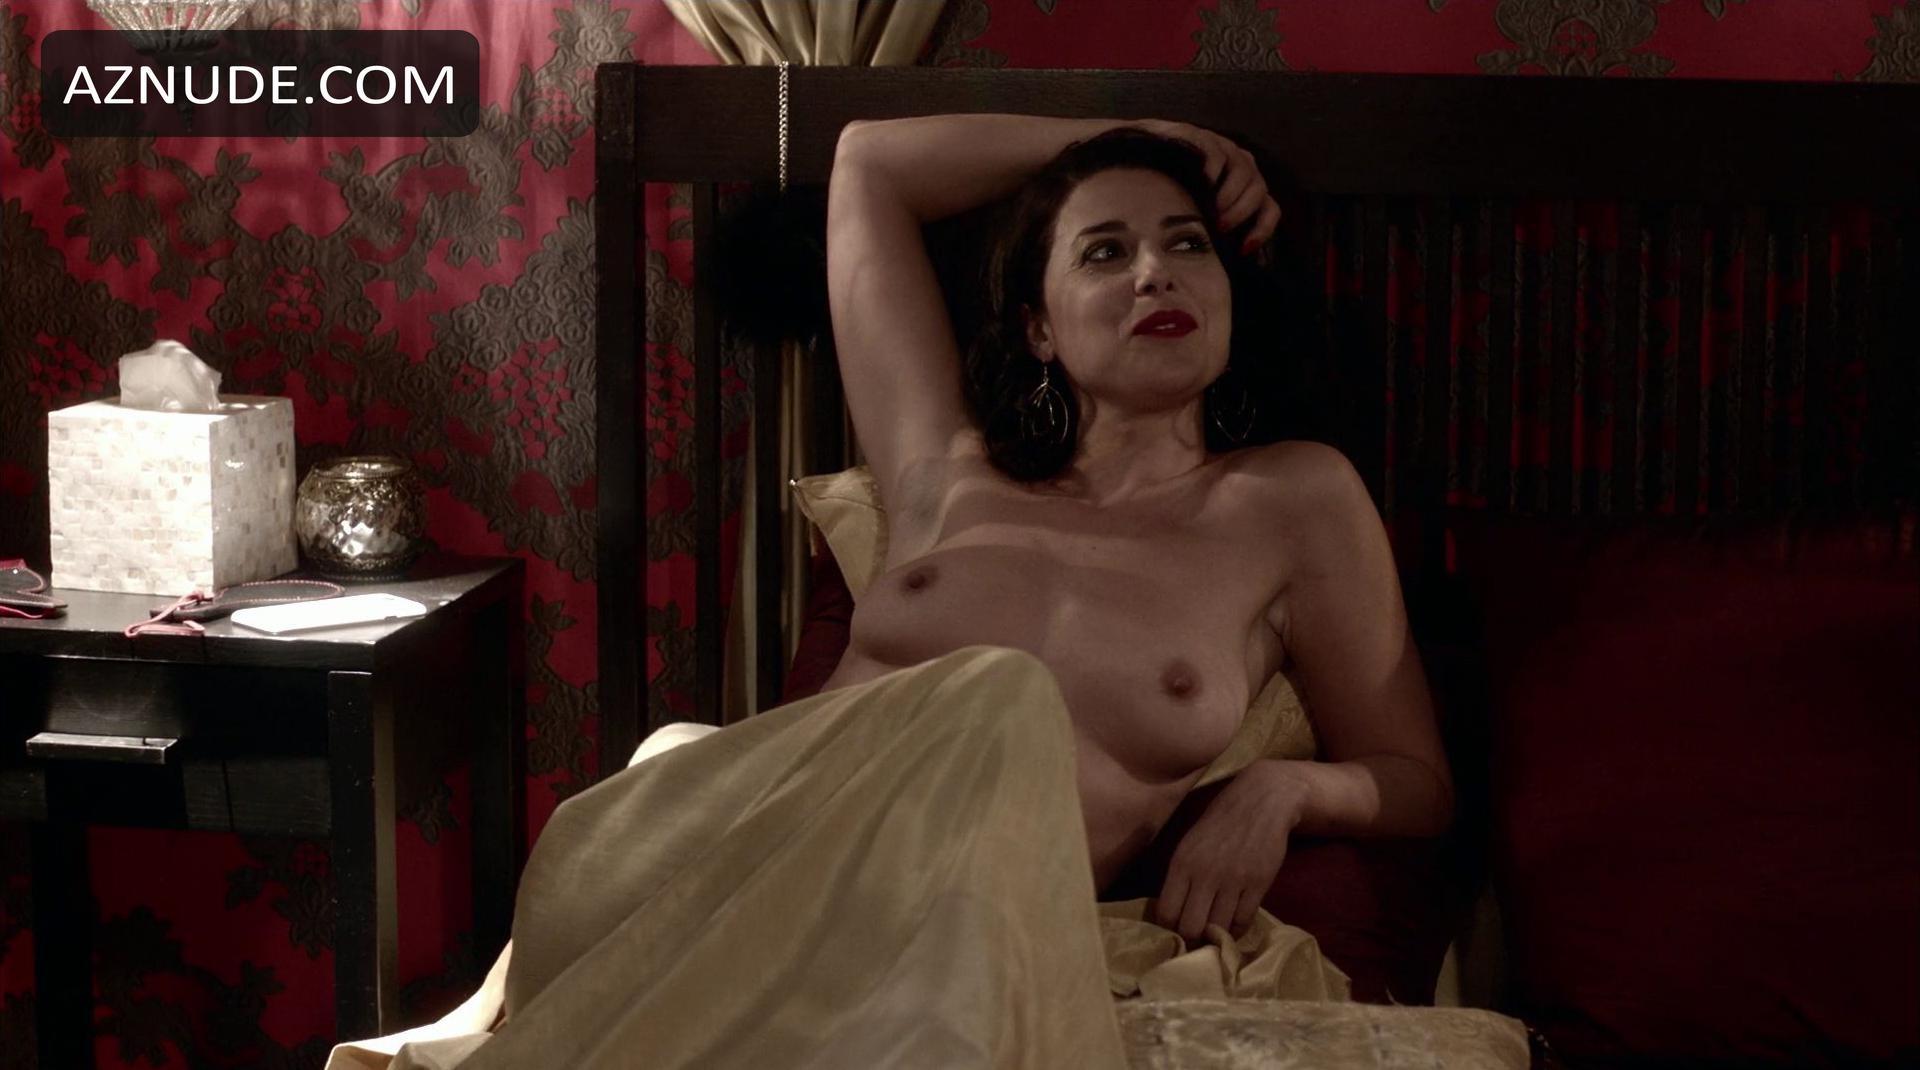 Ruth vega fernandez nude